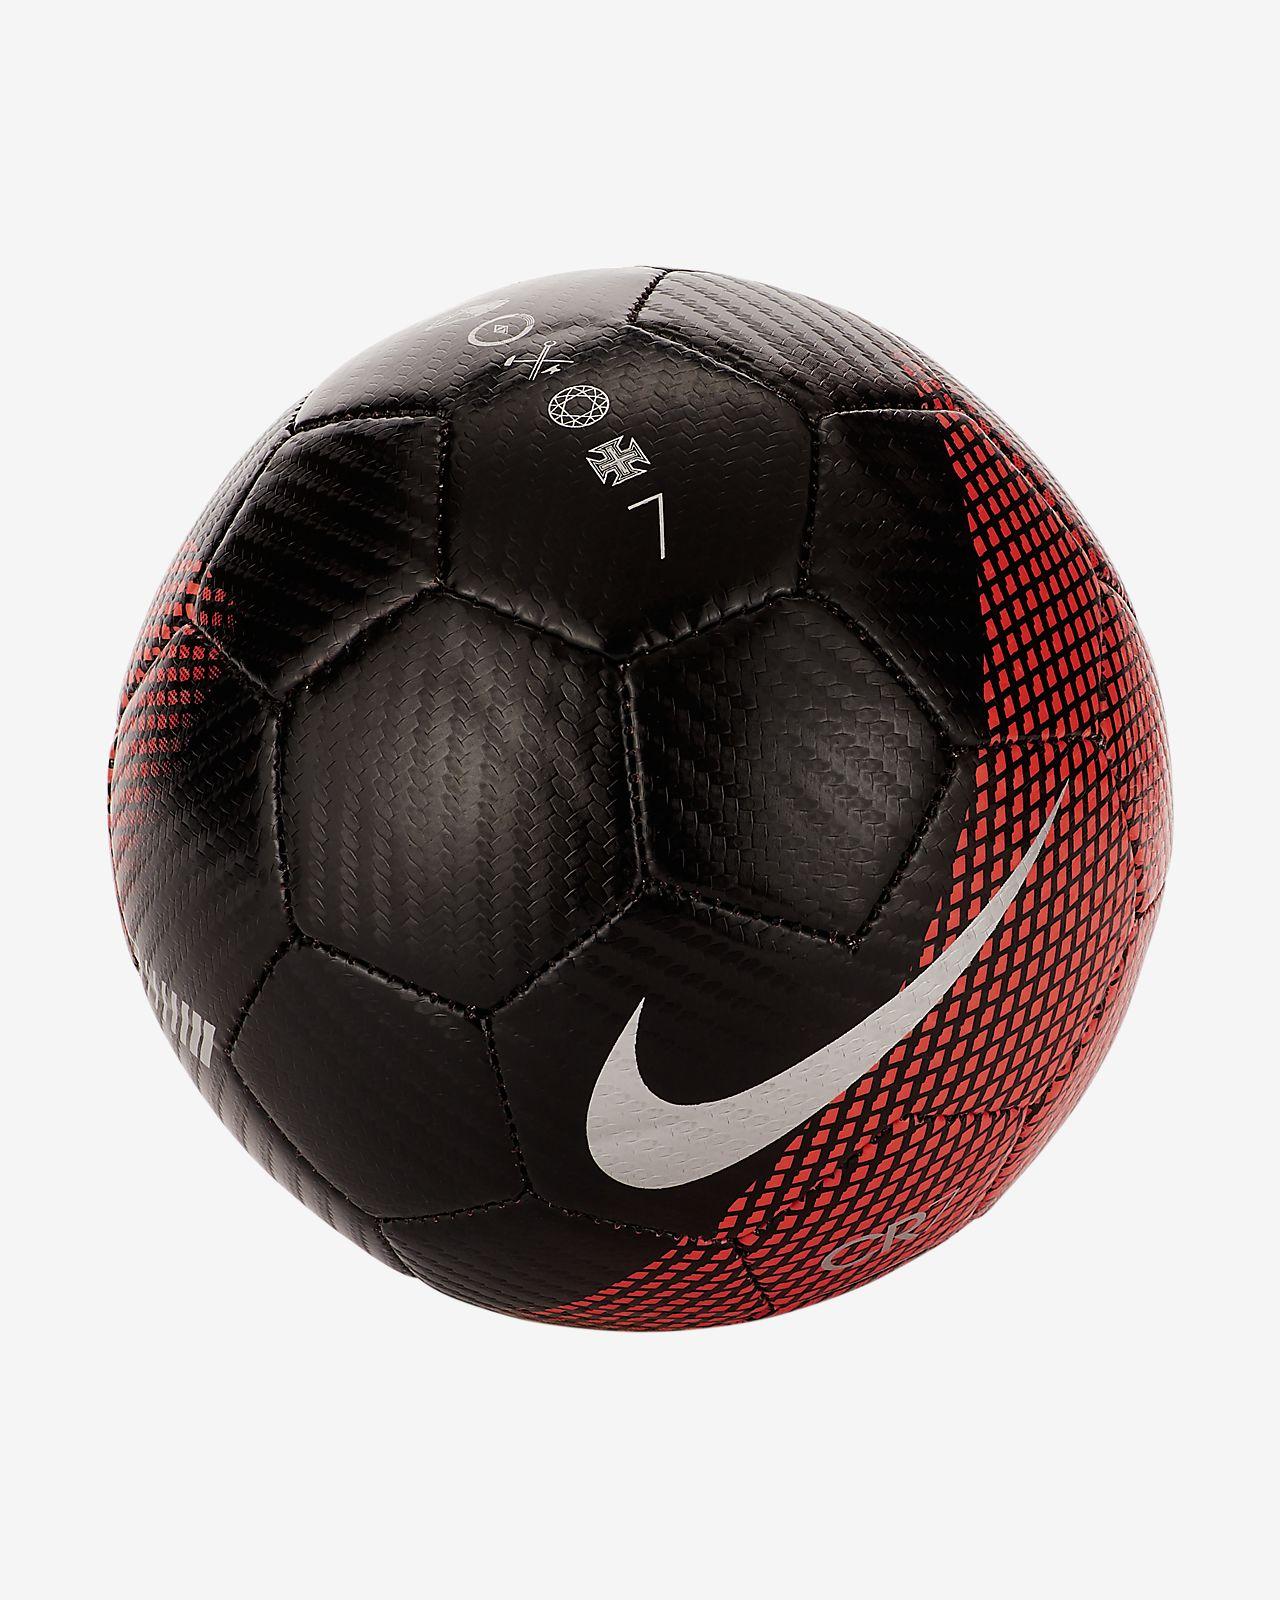 Bola de futebol CR7 Skills